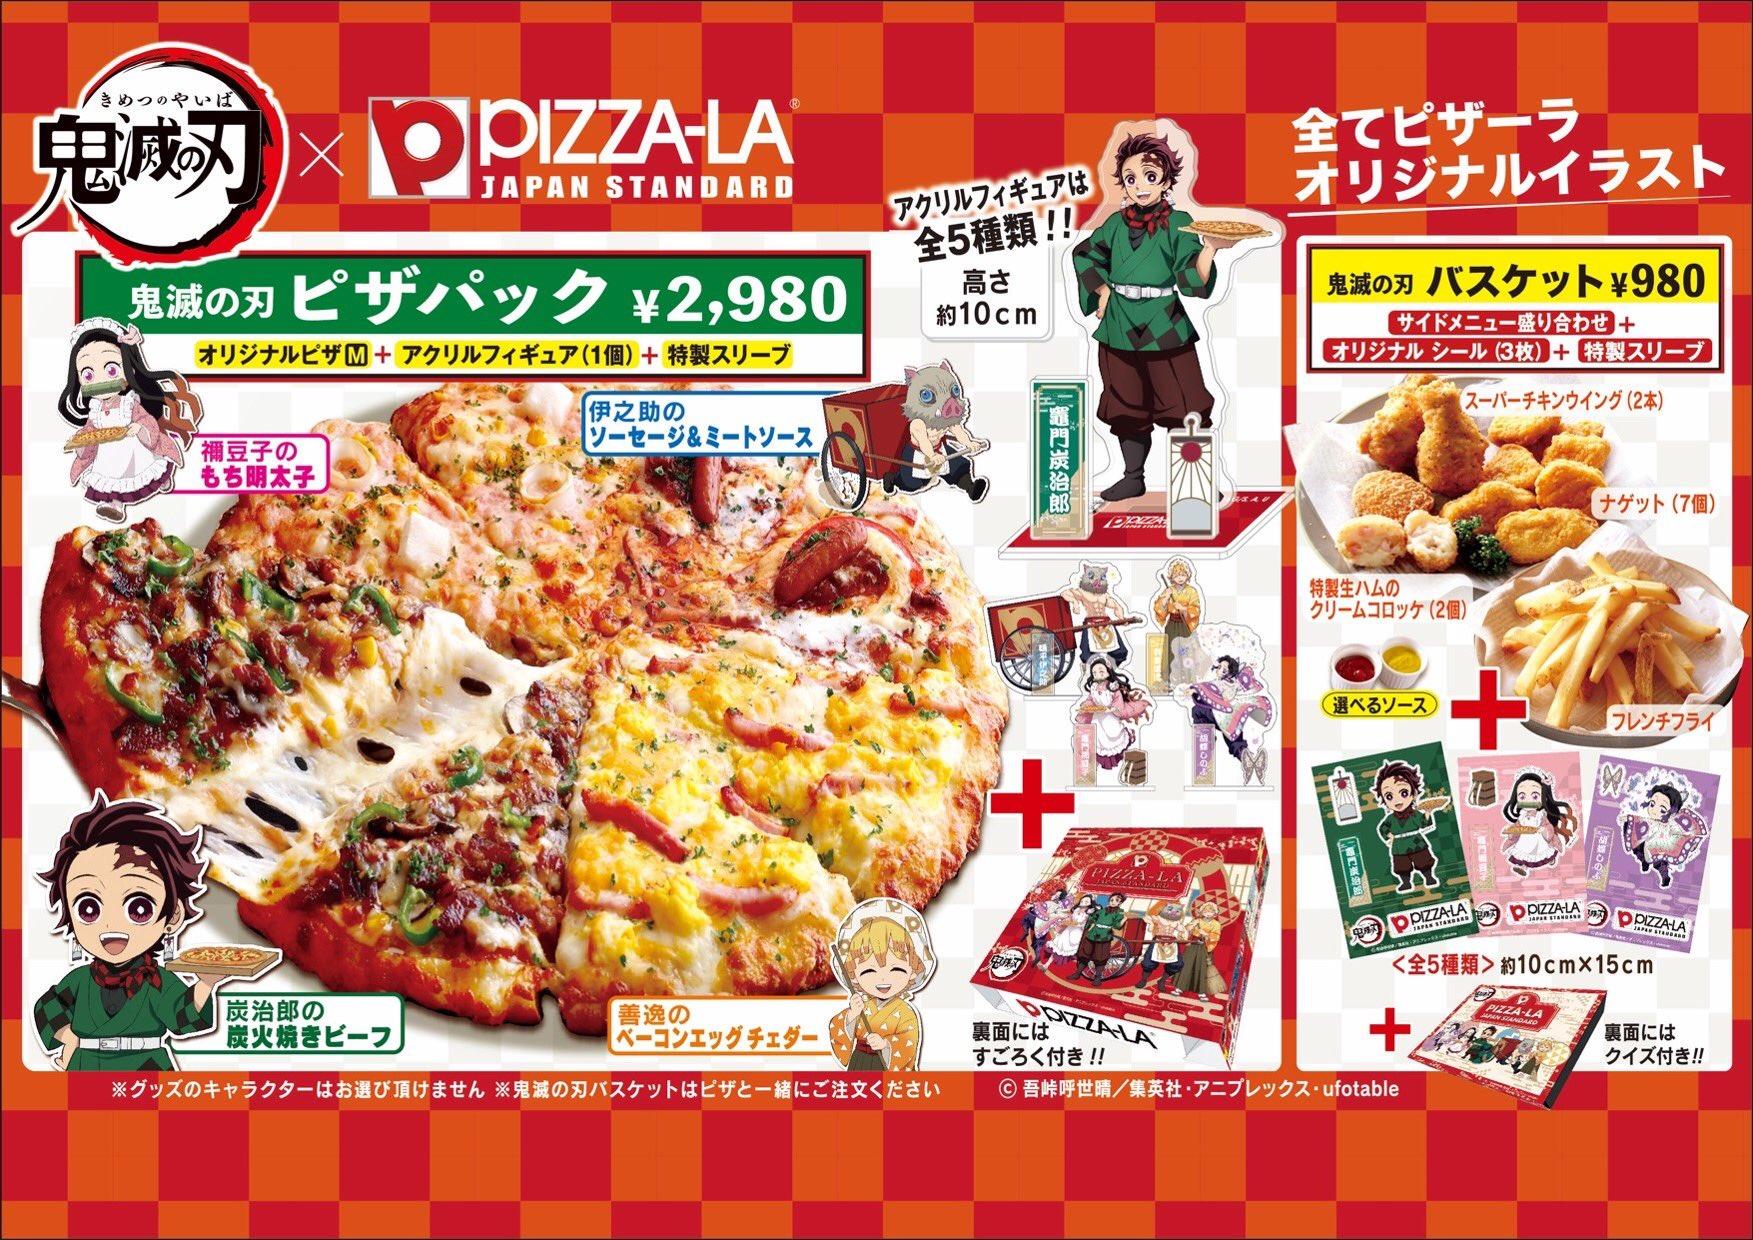 Pizza-La x Demon Slayer